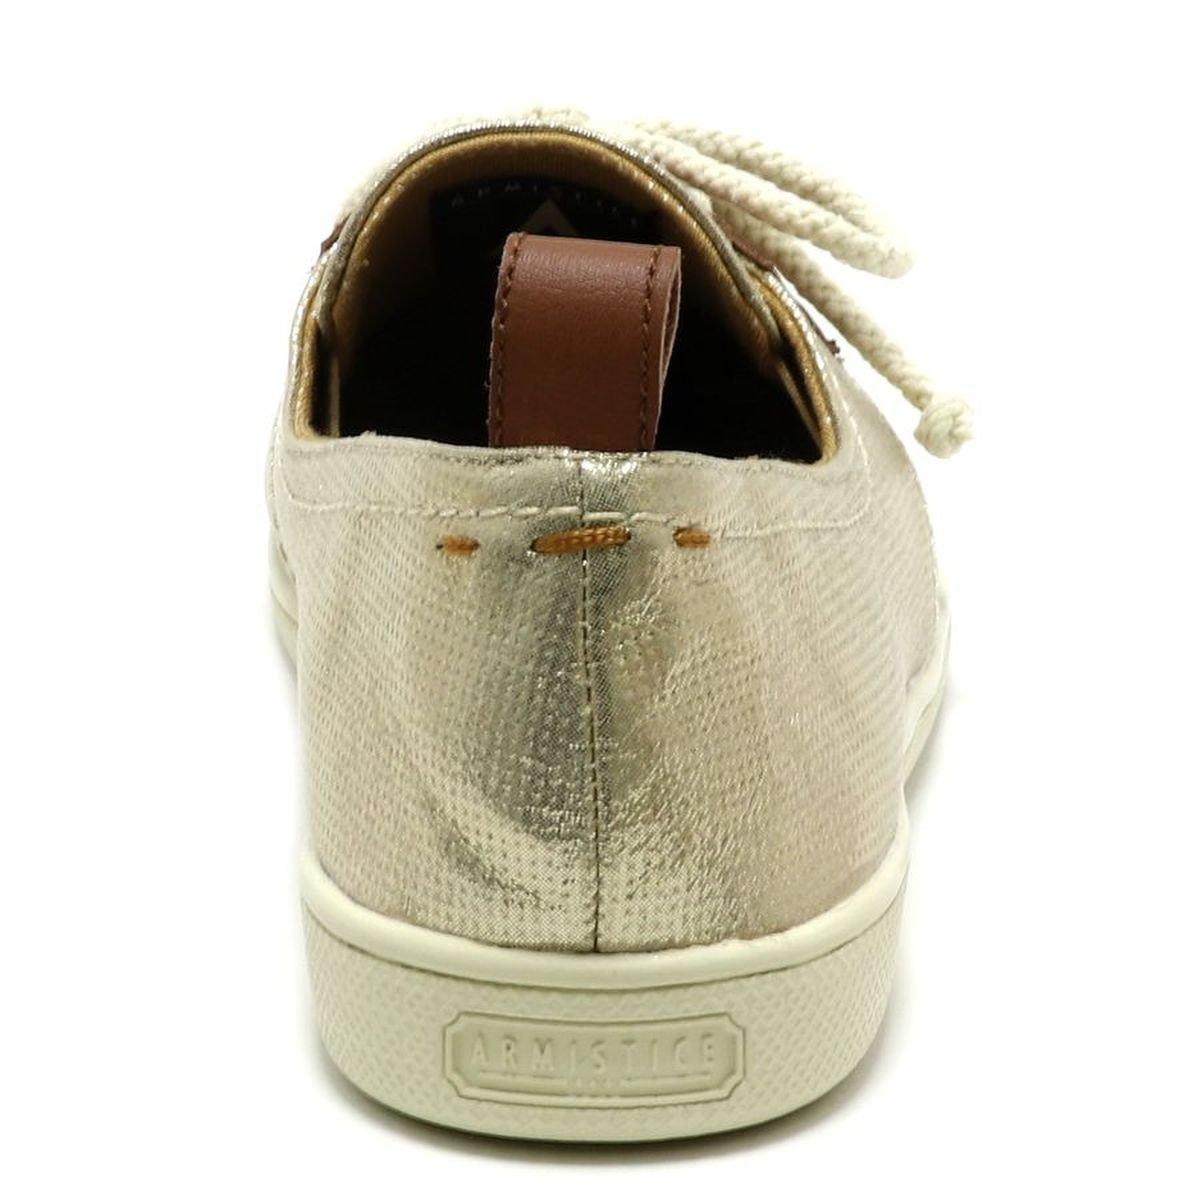 Armistice Stone One Gold, W Comet caoutchouc Gold, One Damen Sneaker Gold bcdd7b